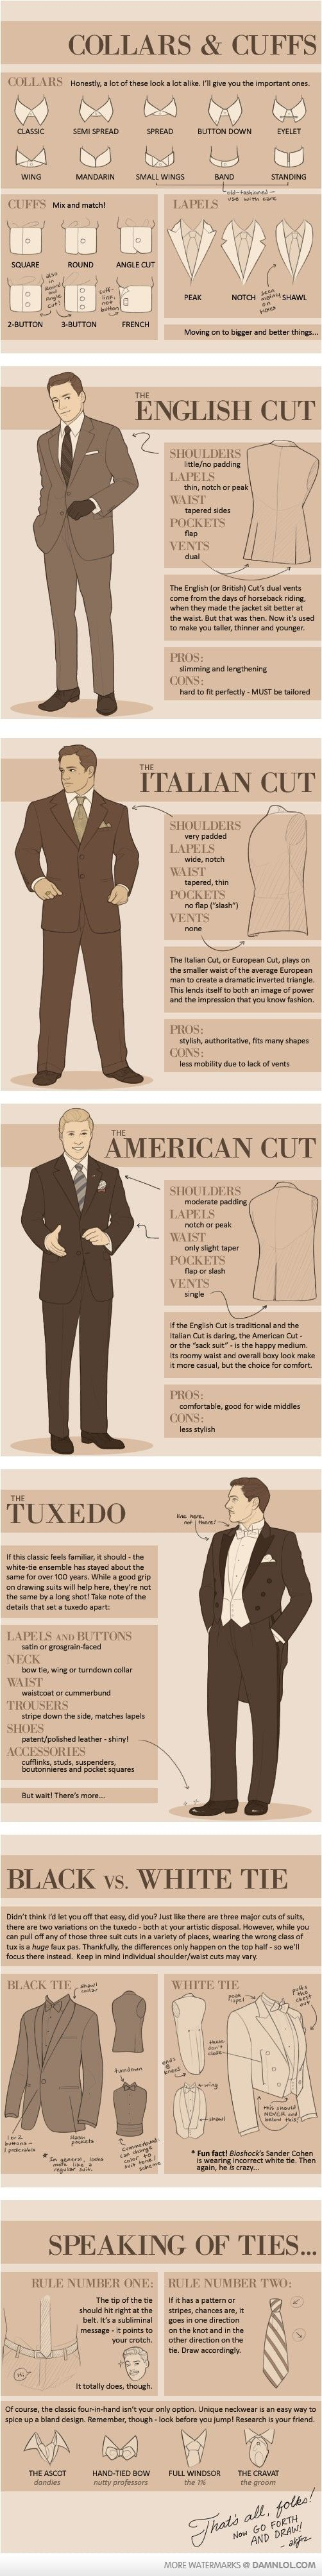 mens suit styles explained